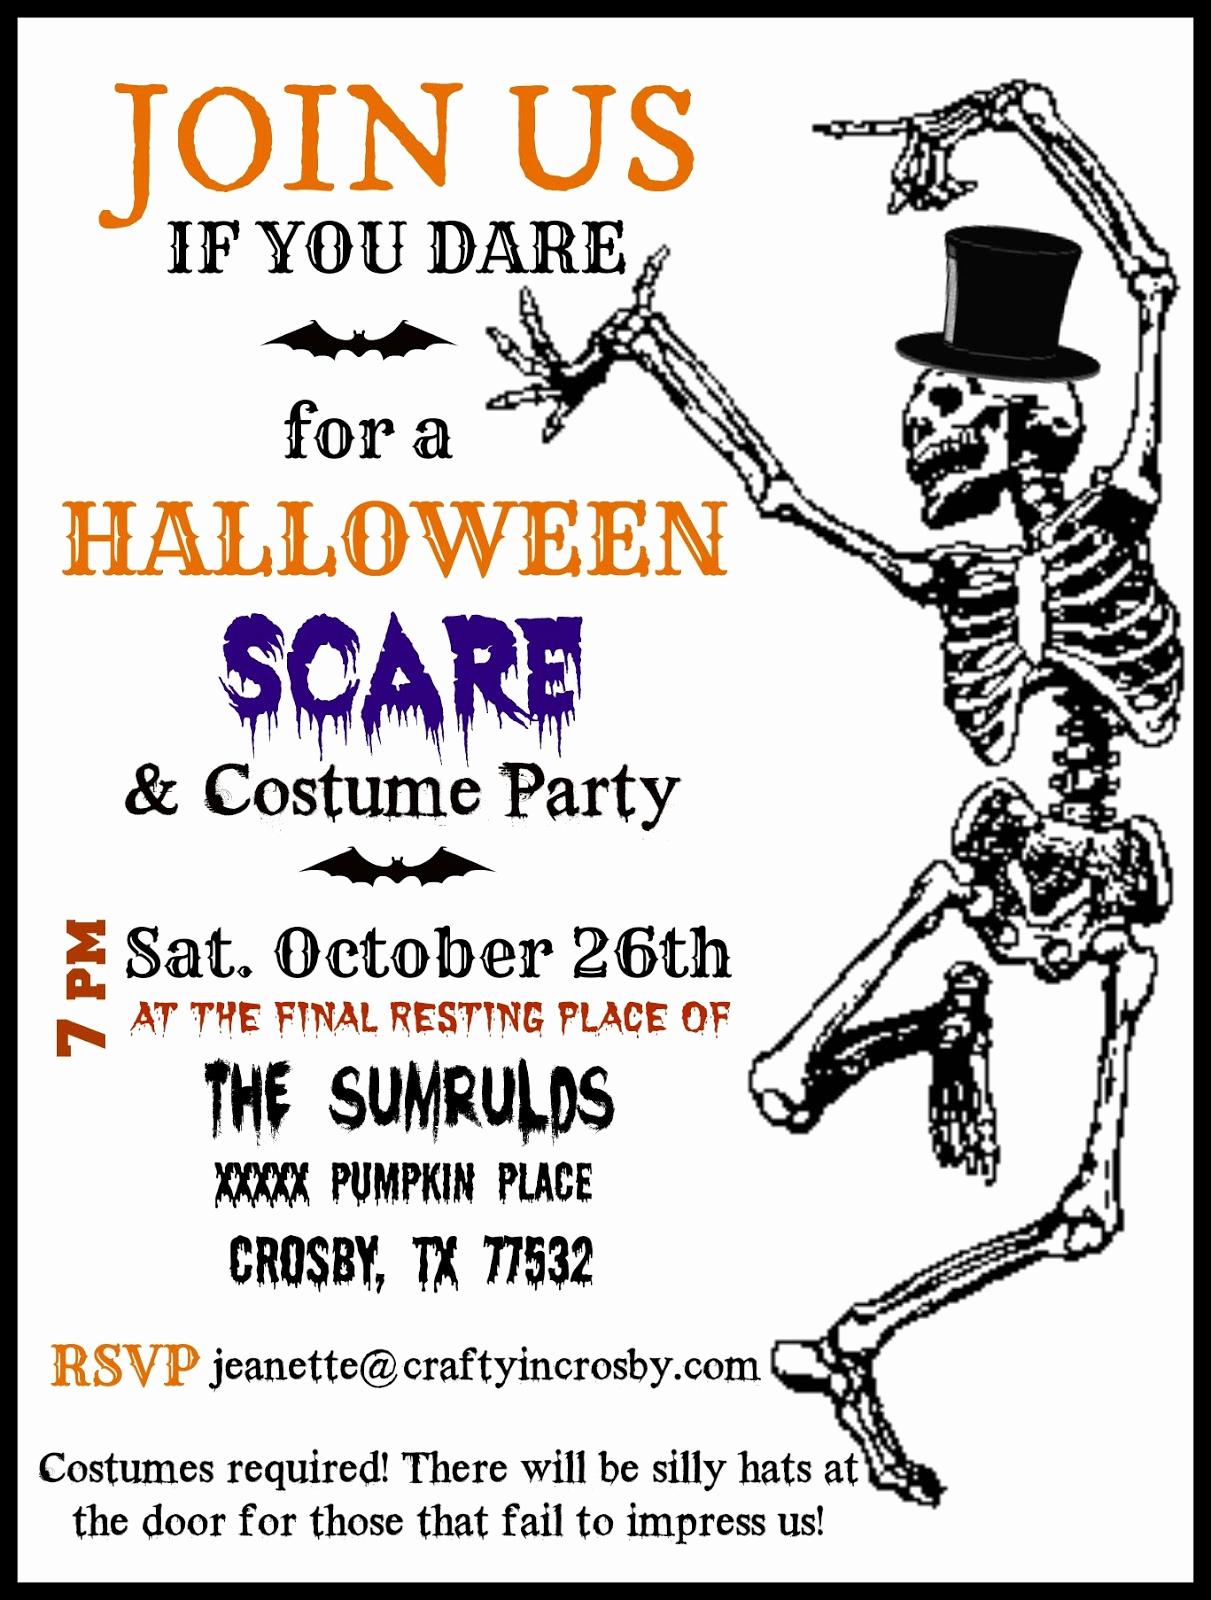 Halloween Party Invitation Template Fresh Crafty In Crosby Halloween Party Invitations with Template